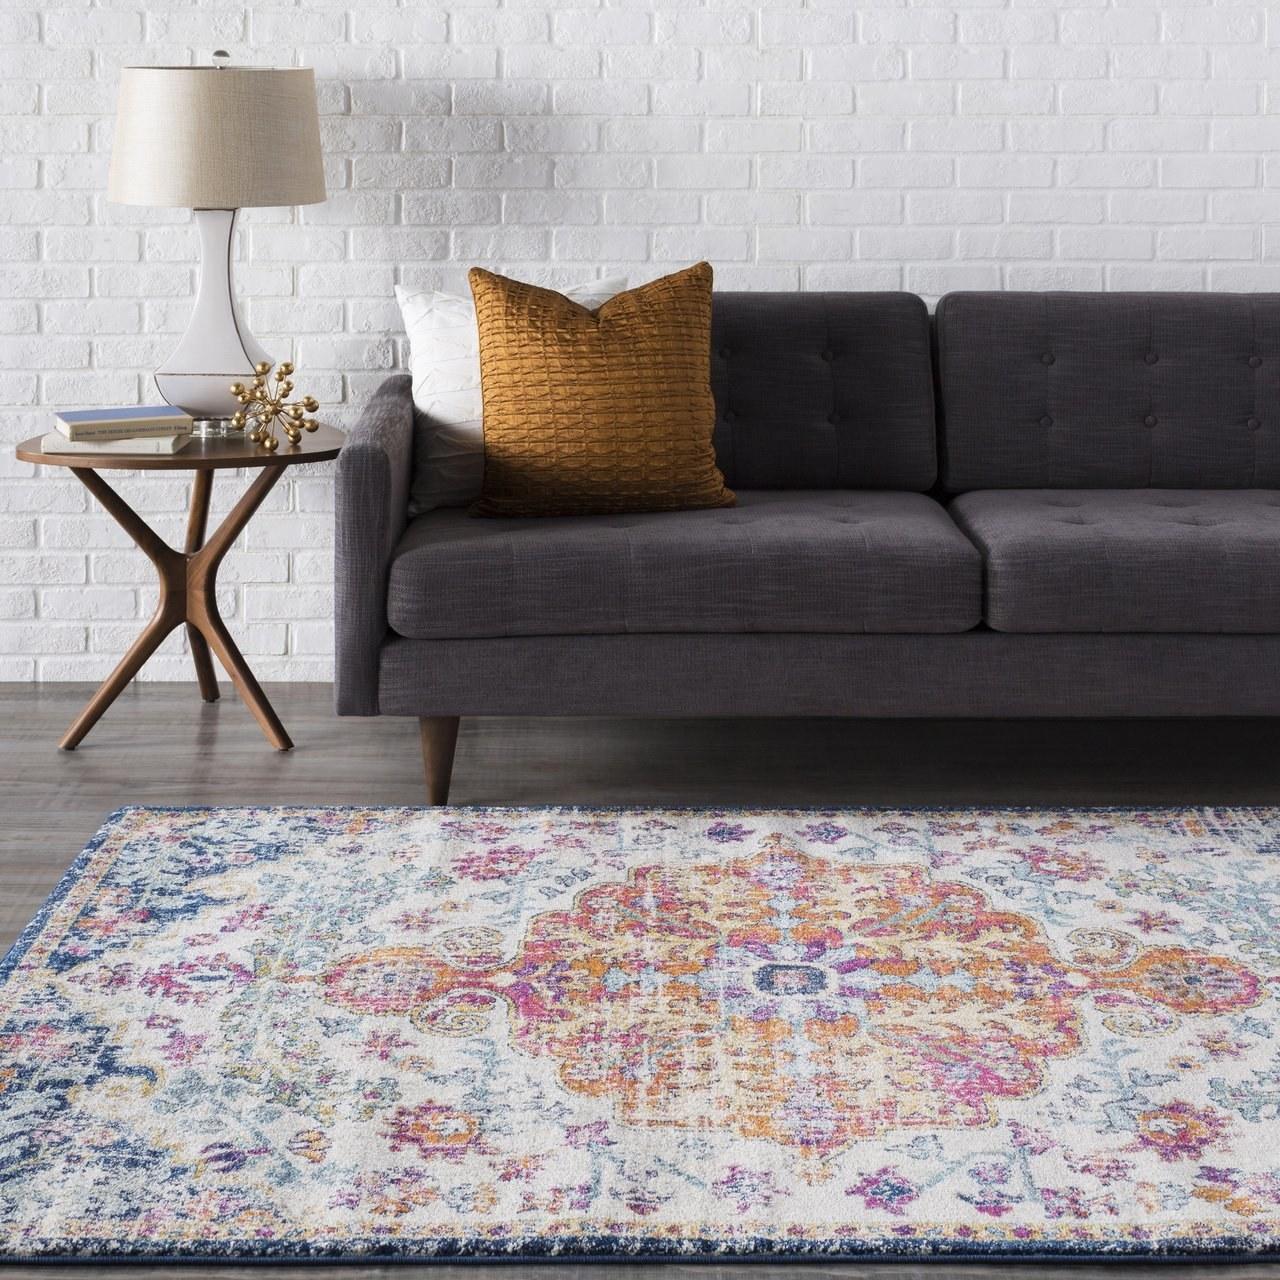 white, orange, pink, blue faux-distressed floral pattern rug